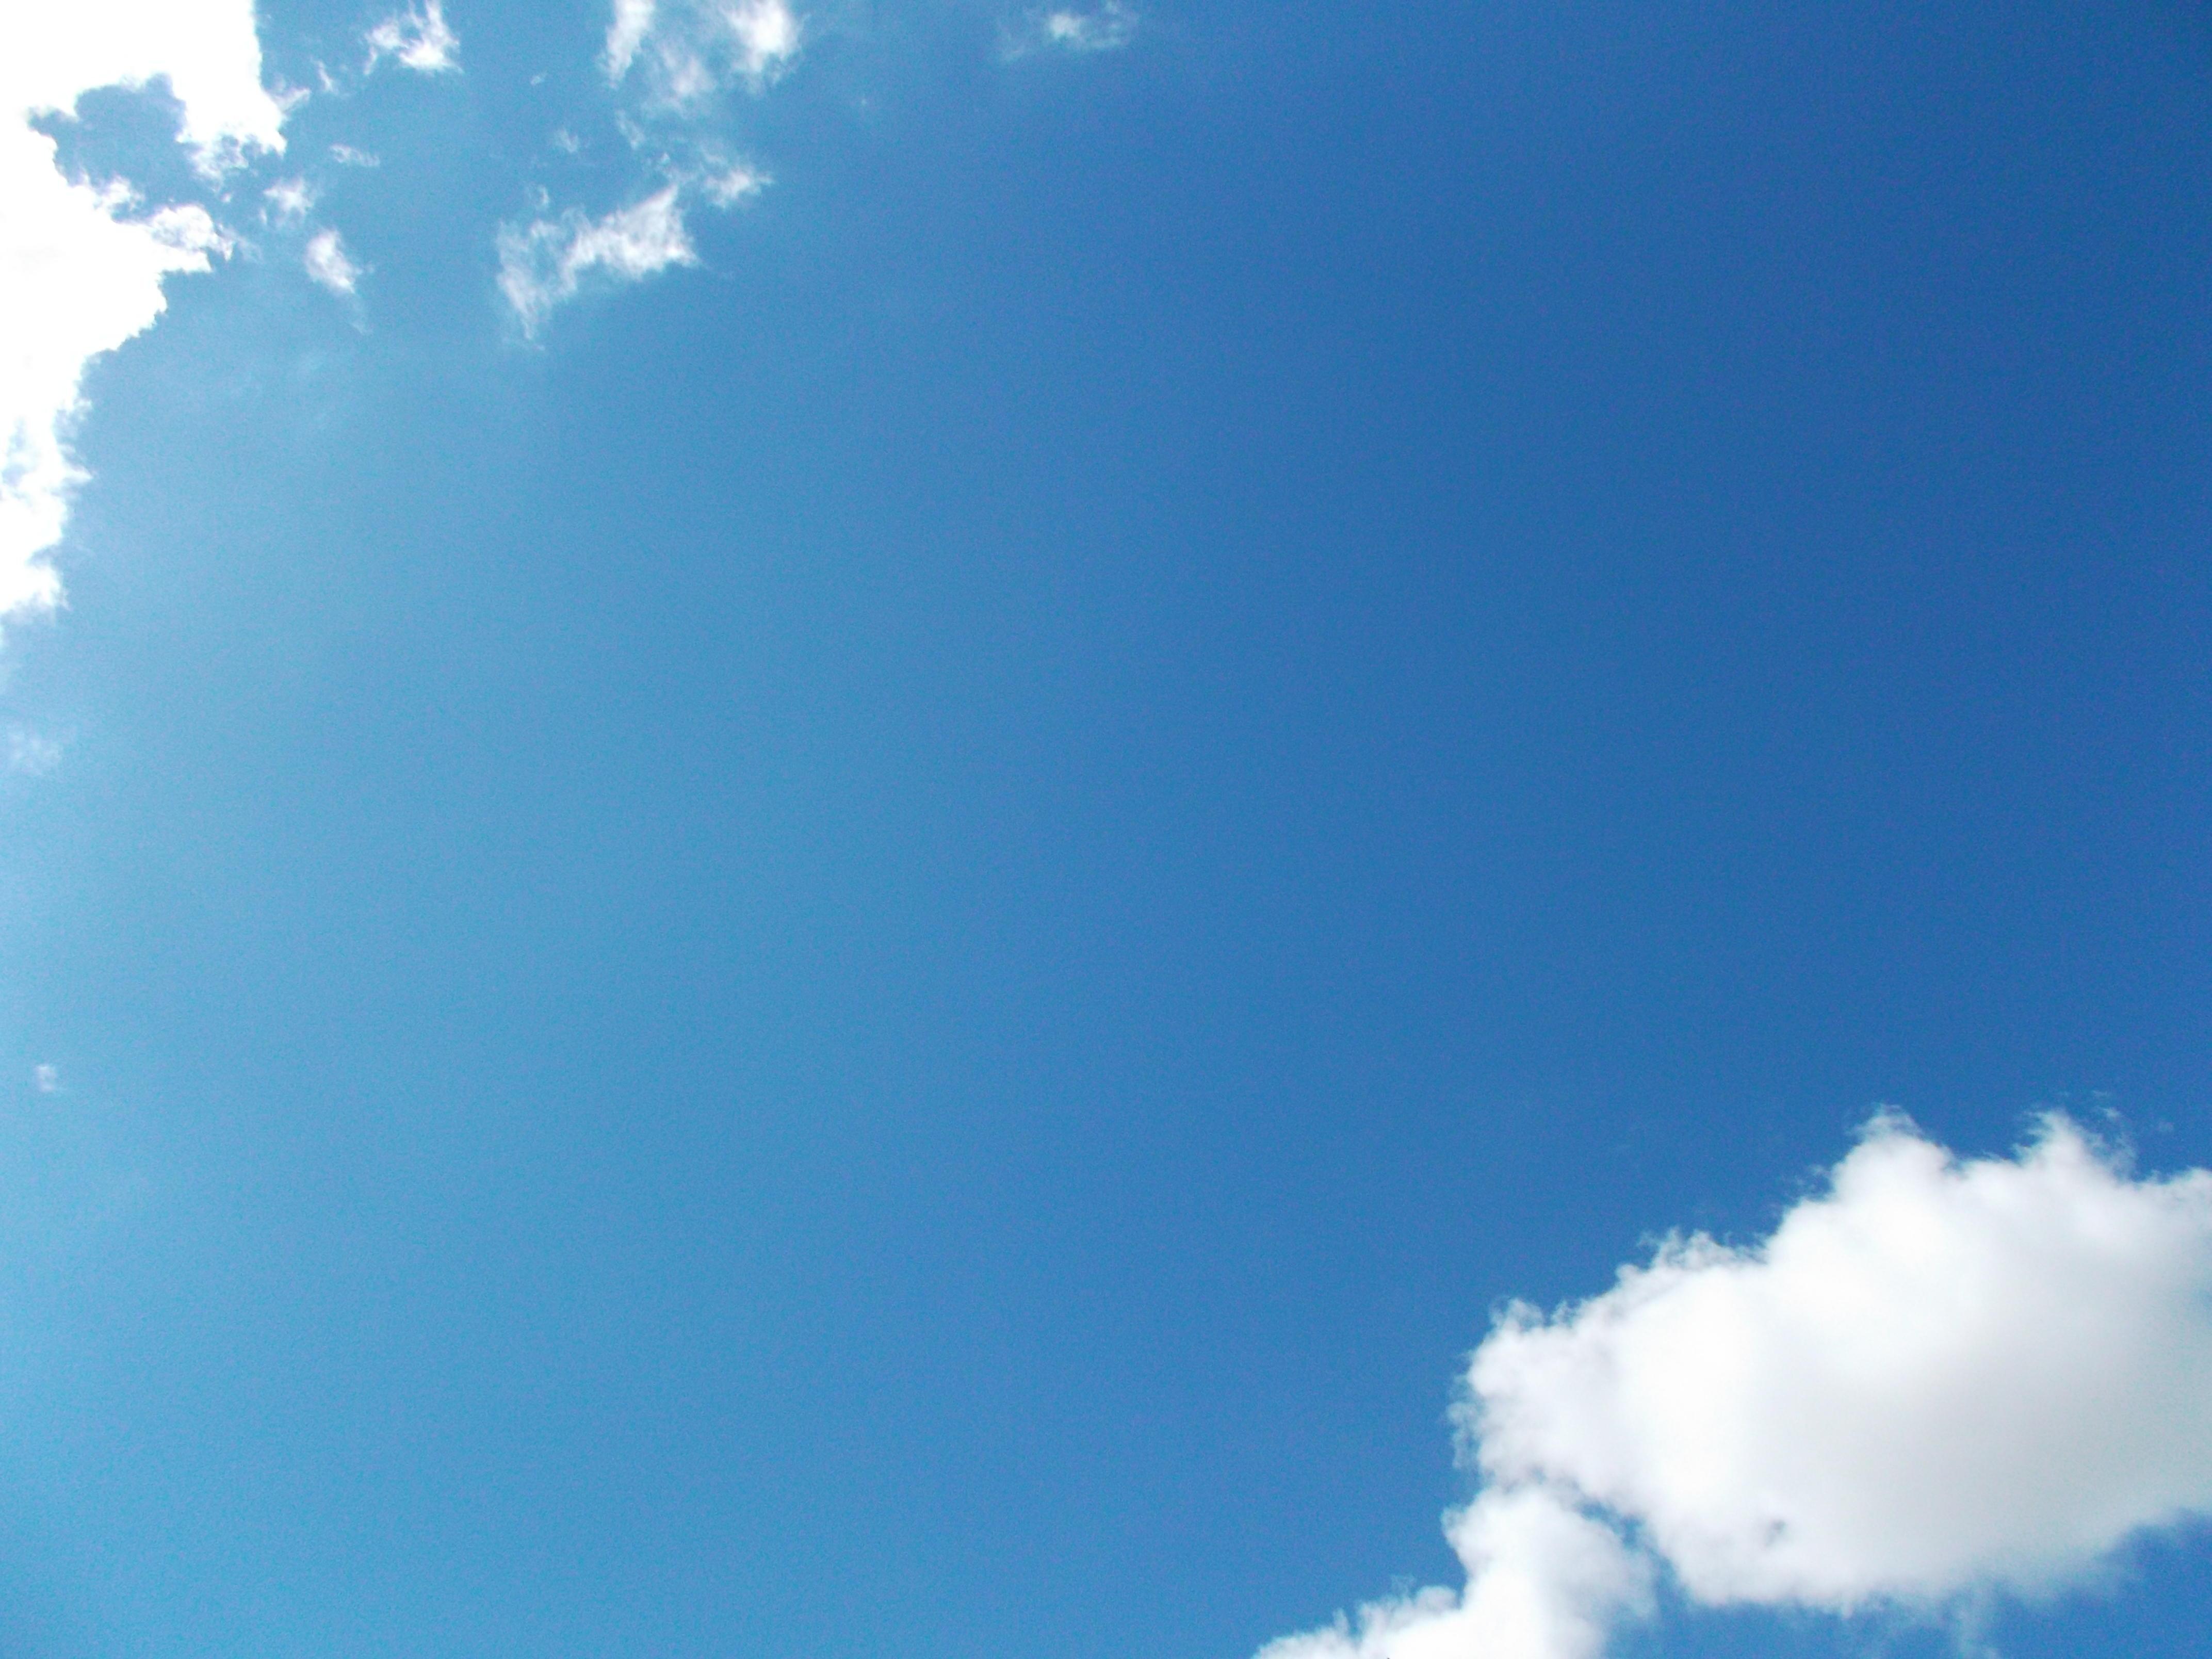 2013-04-28 Longitude -0.371 Latitude 49.182 Altitude 29 Heure 13h01